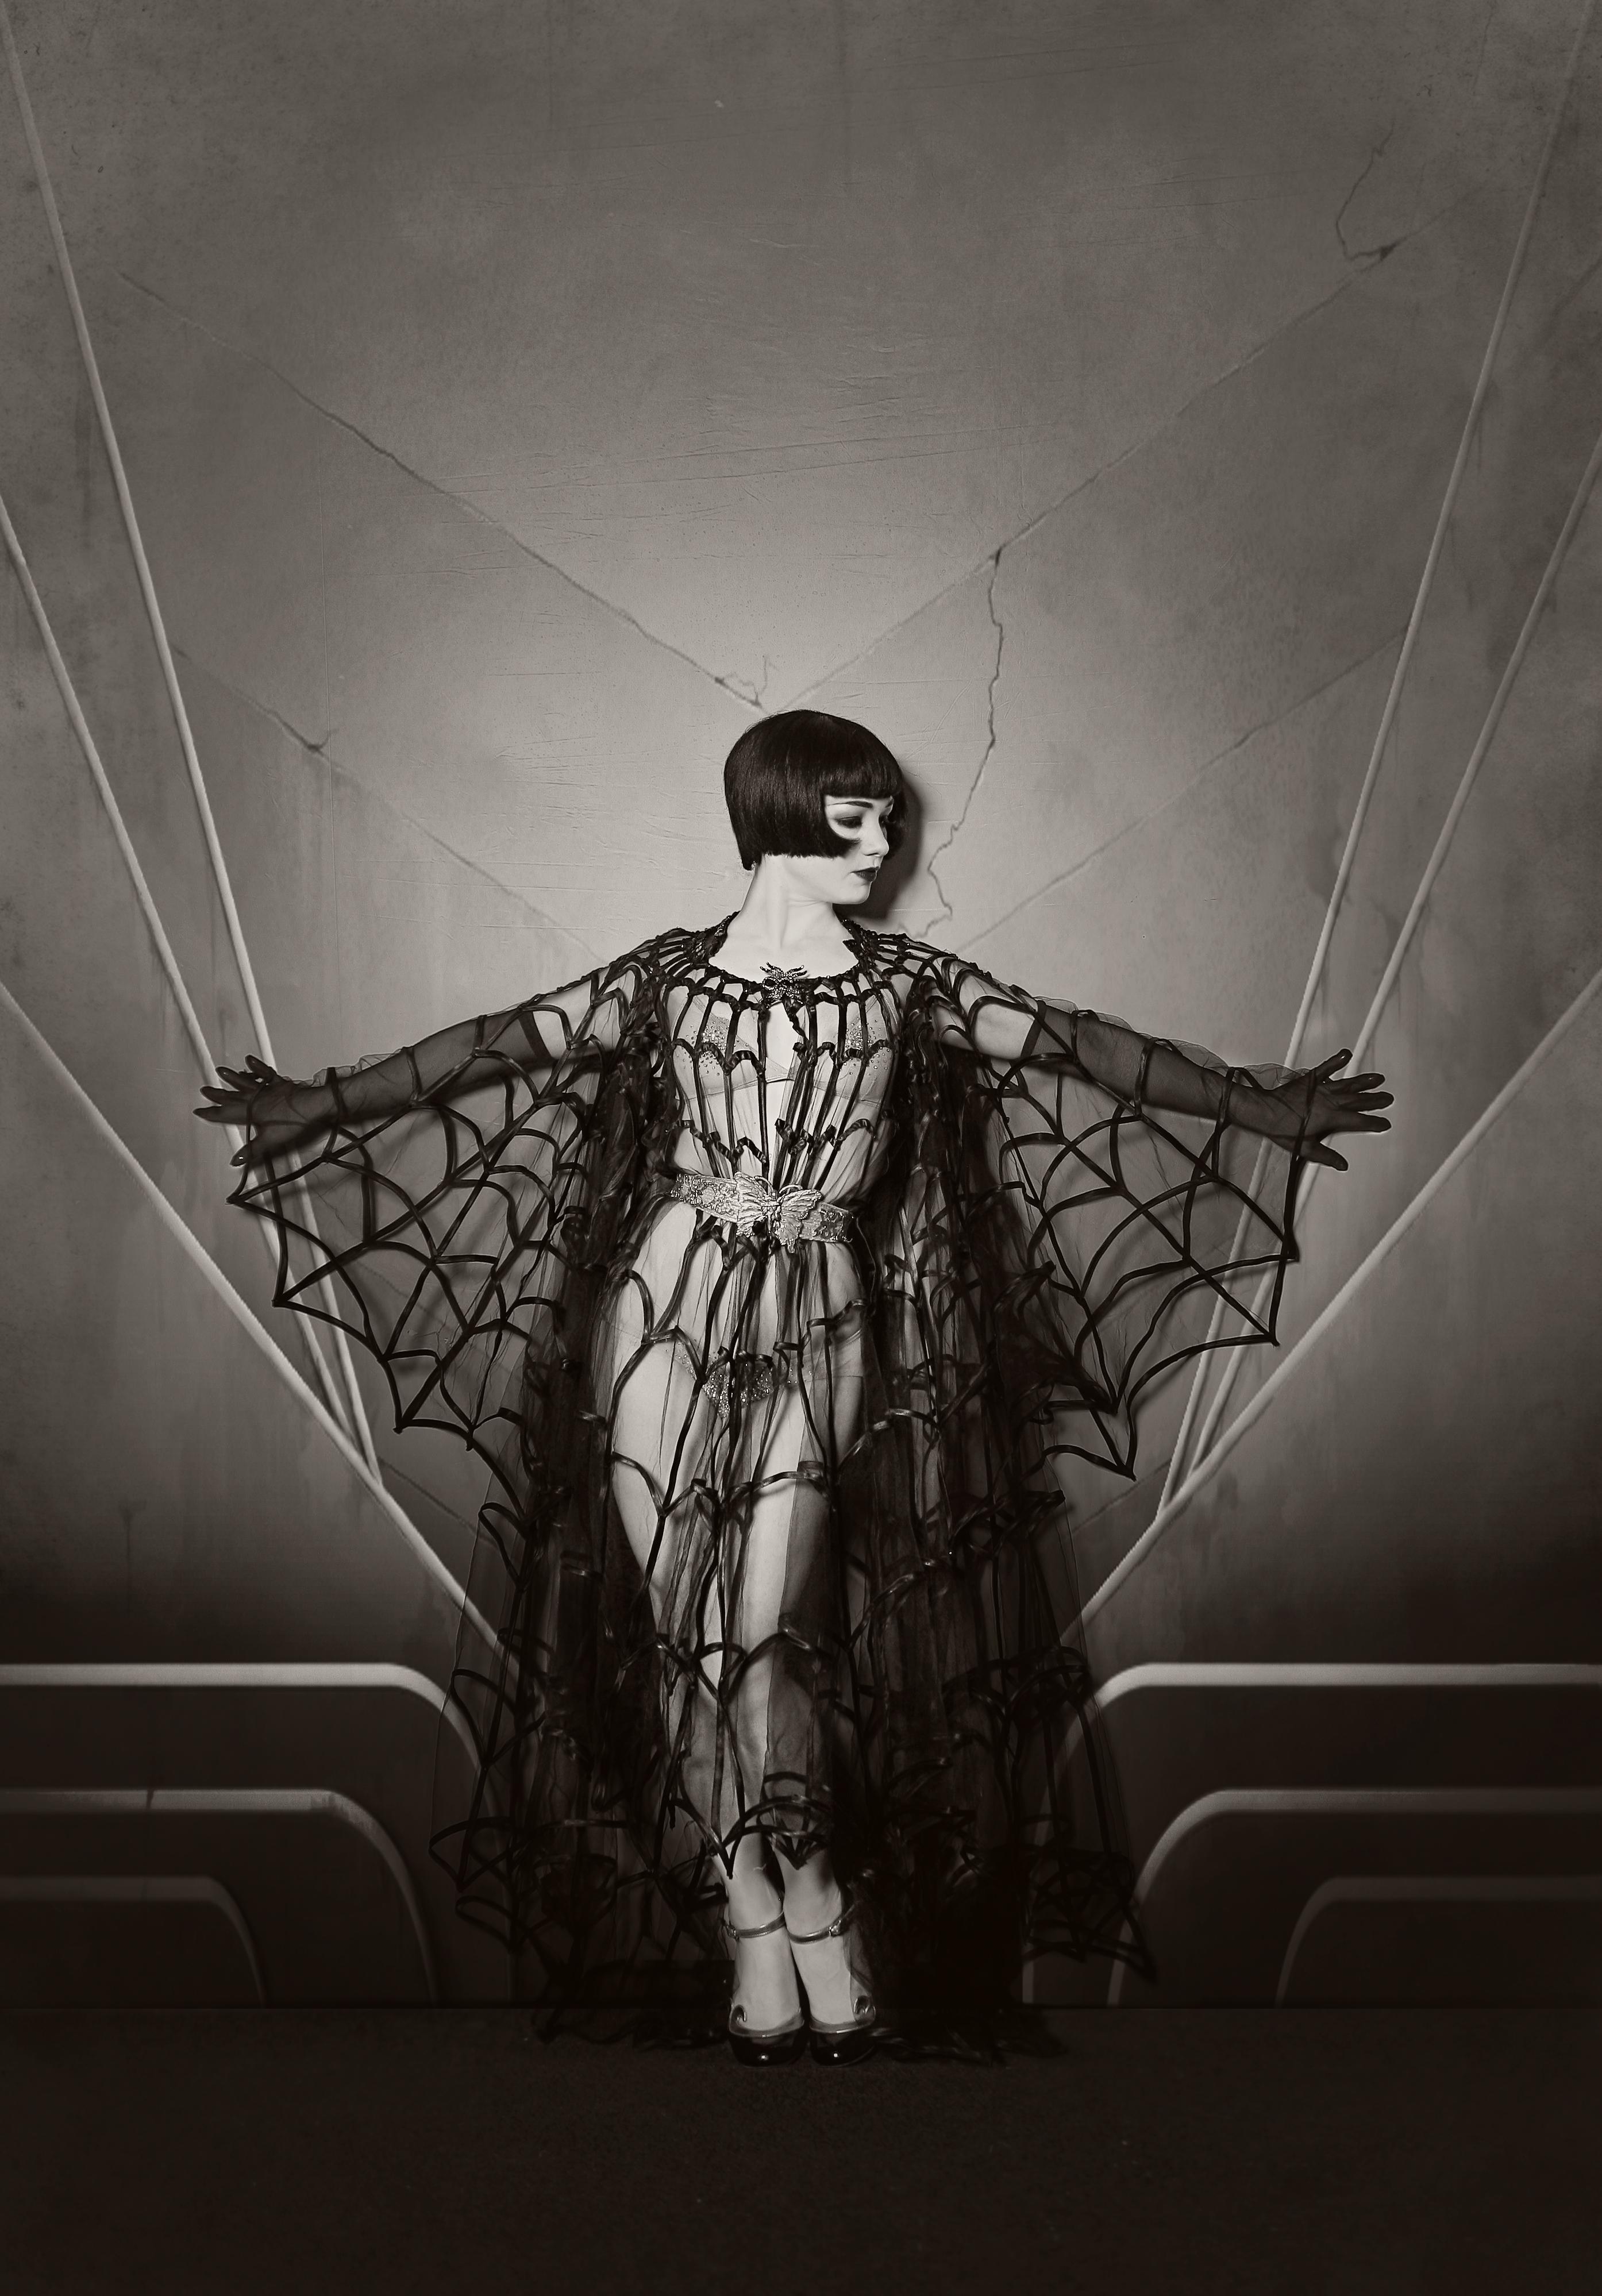 Maria S. Varela - Vicky Butterfly